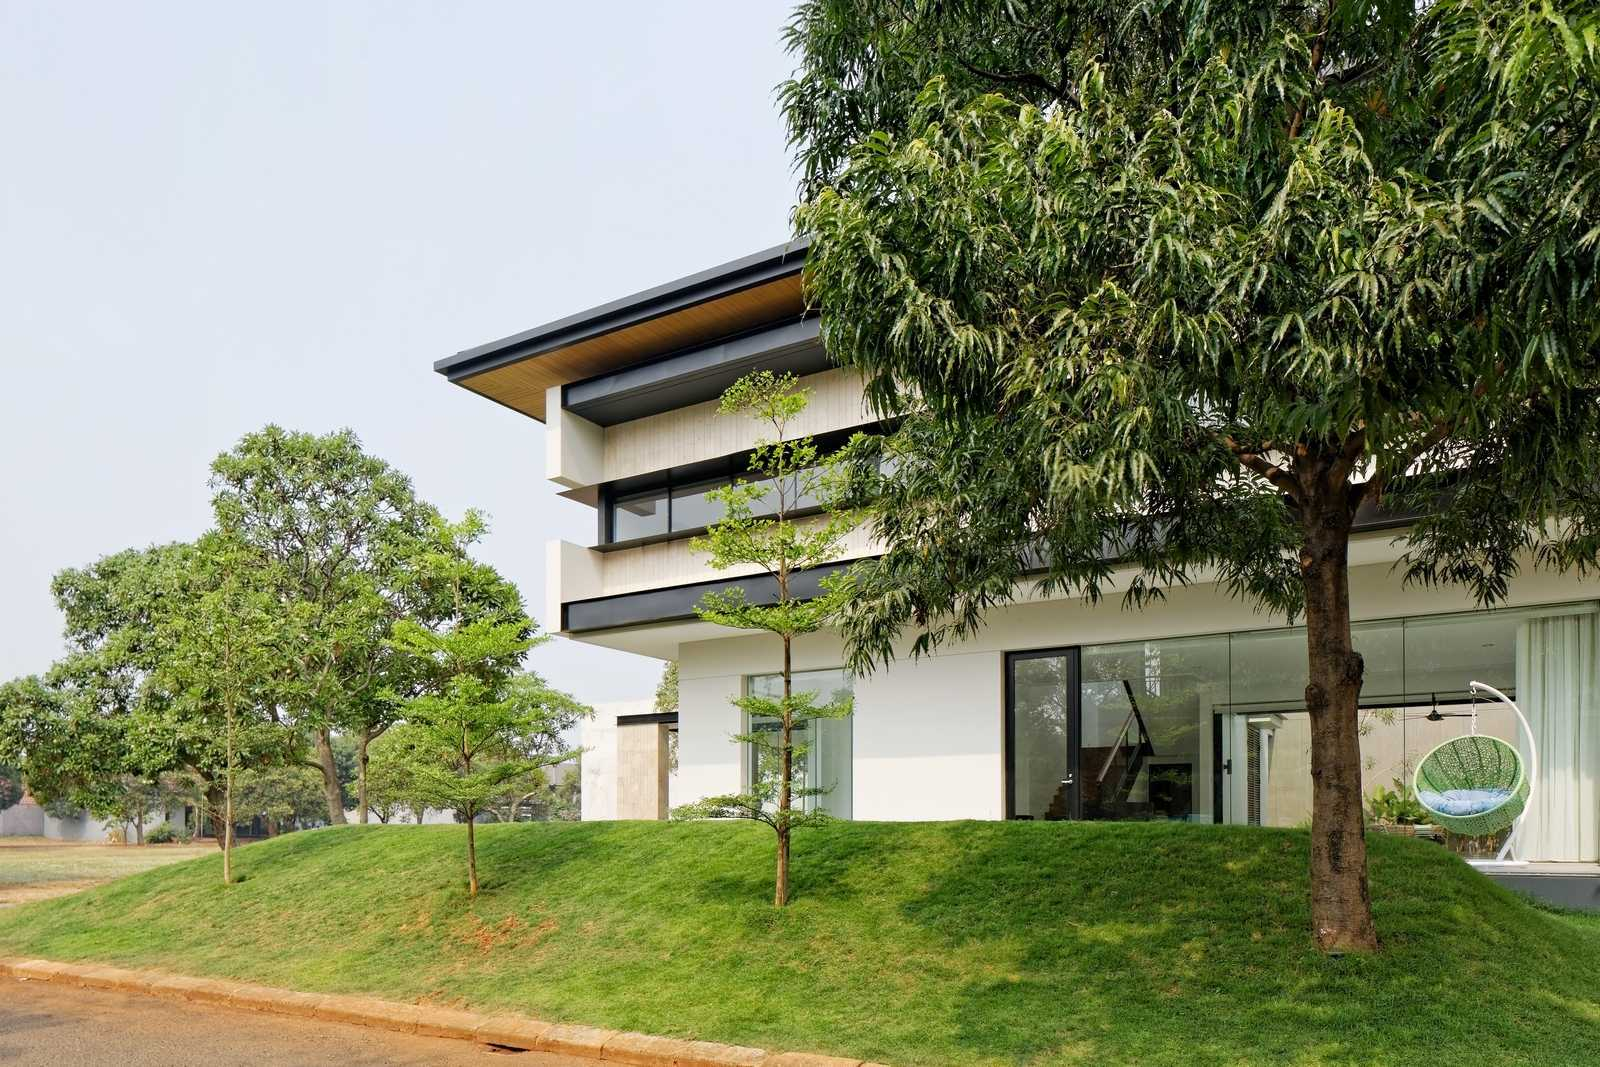 Axialstudio Rs House Alam Sutera - Tangerang Alam Sutera - Tangerang Street View Modern  29248